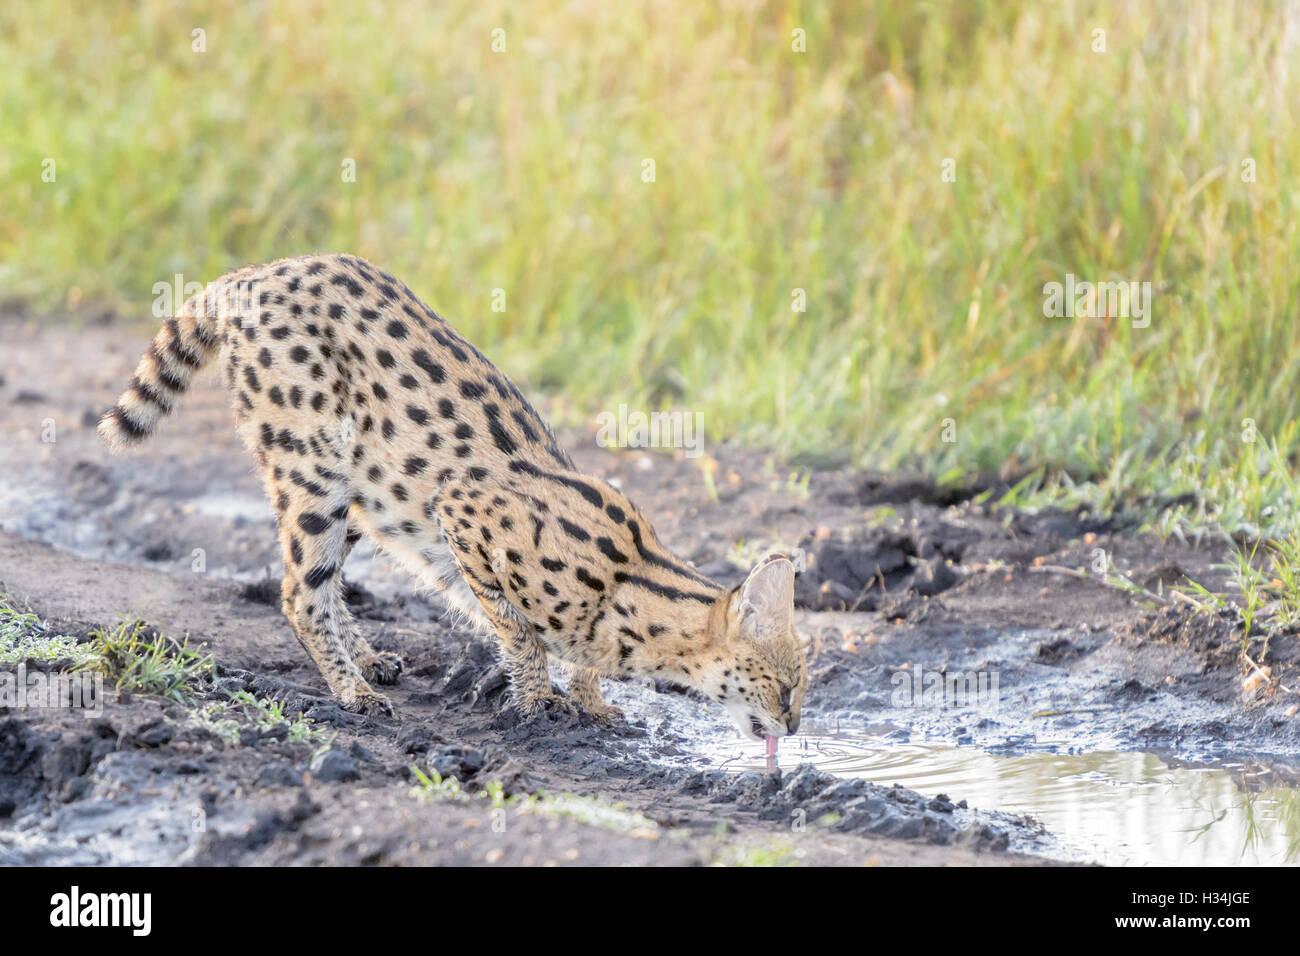 Serval (Leptailurus serval, Felis serval), drinking water in early morning light, Masai Mara National Park, Kenya. Stock Photo